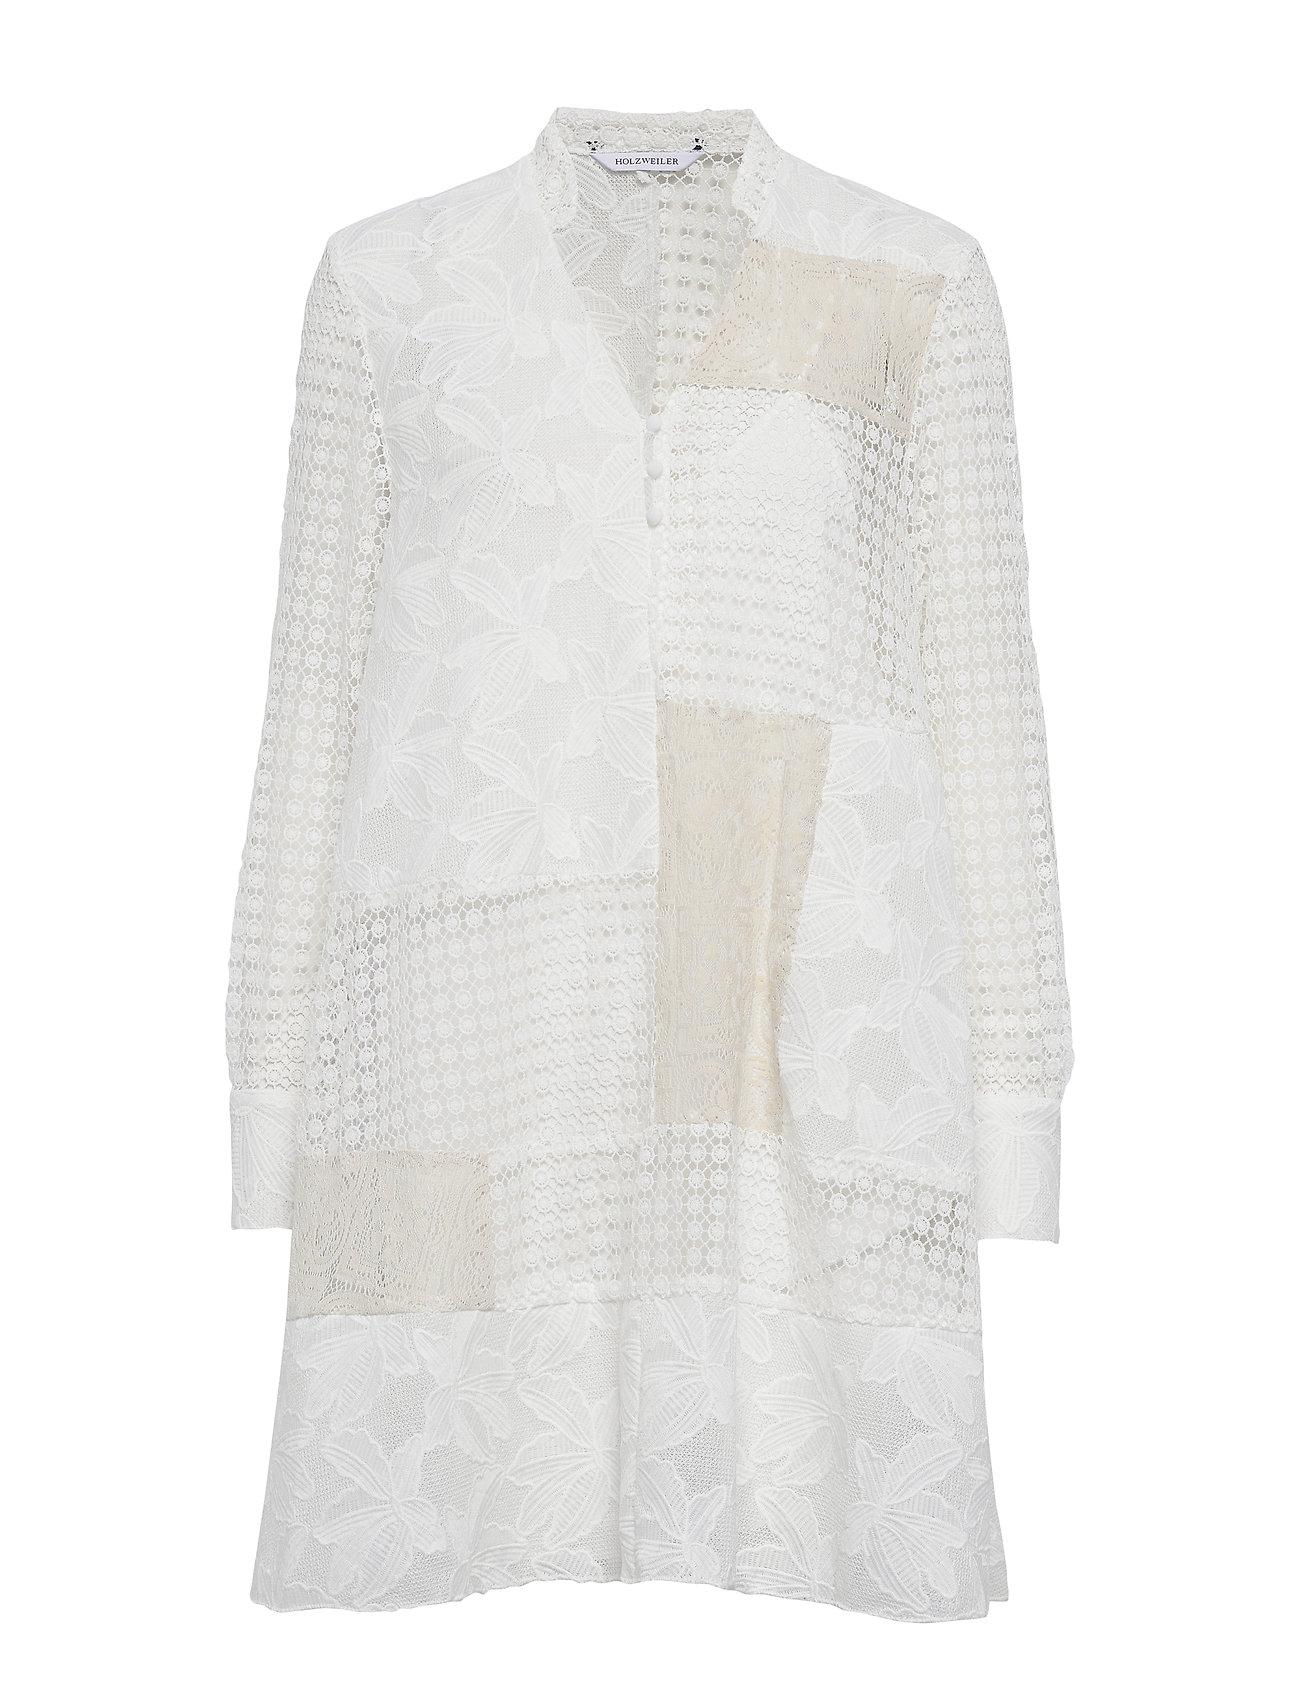 Image of Affair Dress Kort Kjole Hvid HOLZWEILER (3322698155)